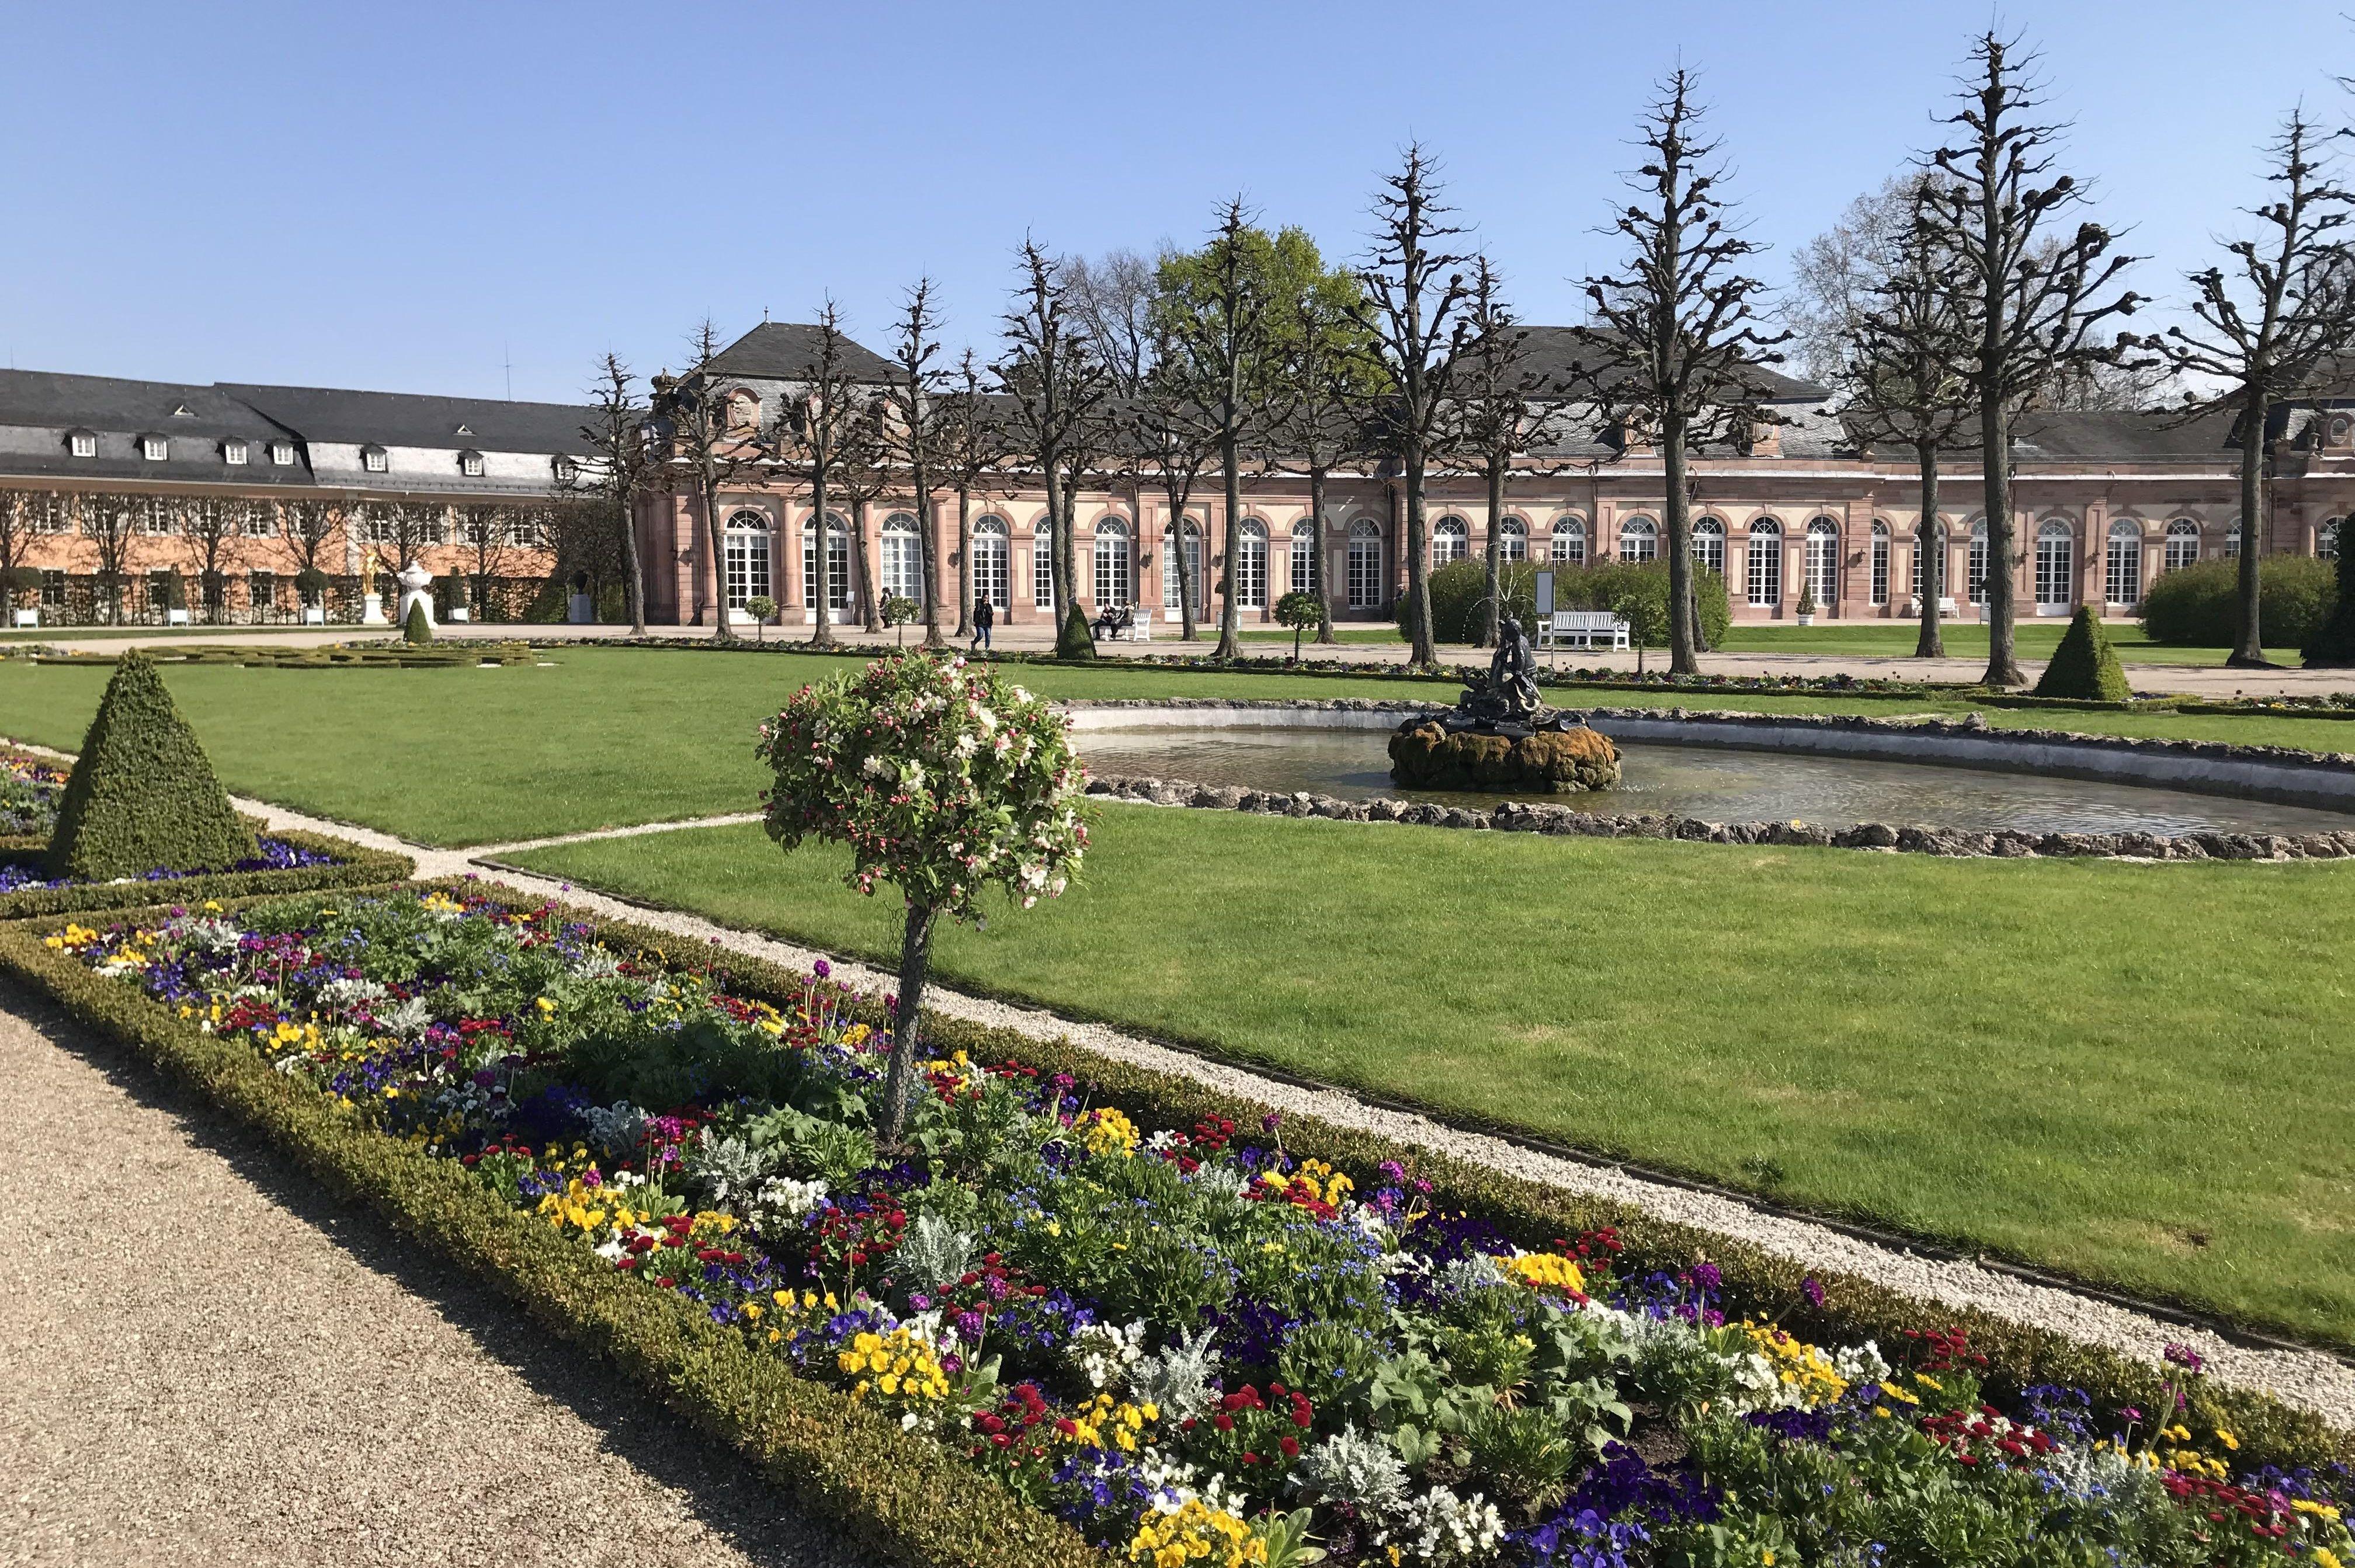 Schloss und Schlossgarten Schwetzingen, Schlossgarten; Foto: Staatsanzeiger für Baden-Württemberg GmbH, Anja Stangl